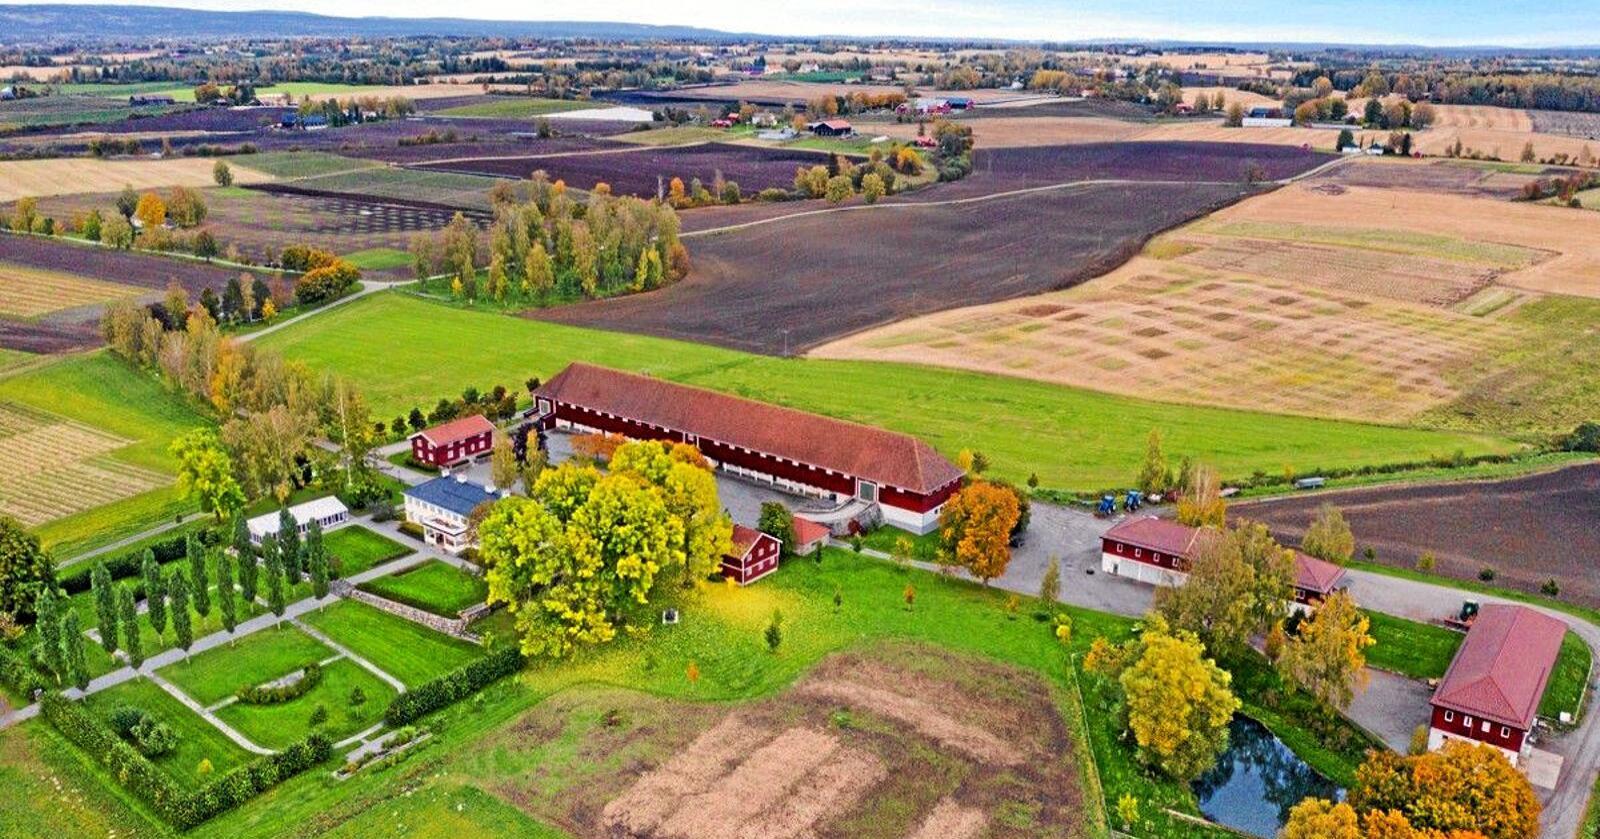 Staur Gård i Stange blei seld til advokat Ola Haugen. Foto: Tegneby & Grønnerød Landbruksmegling